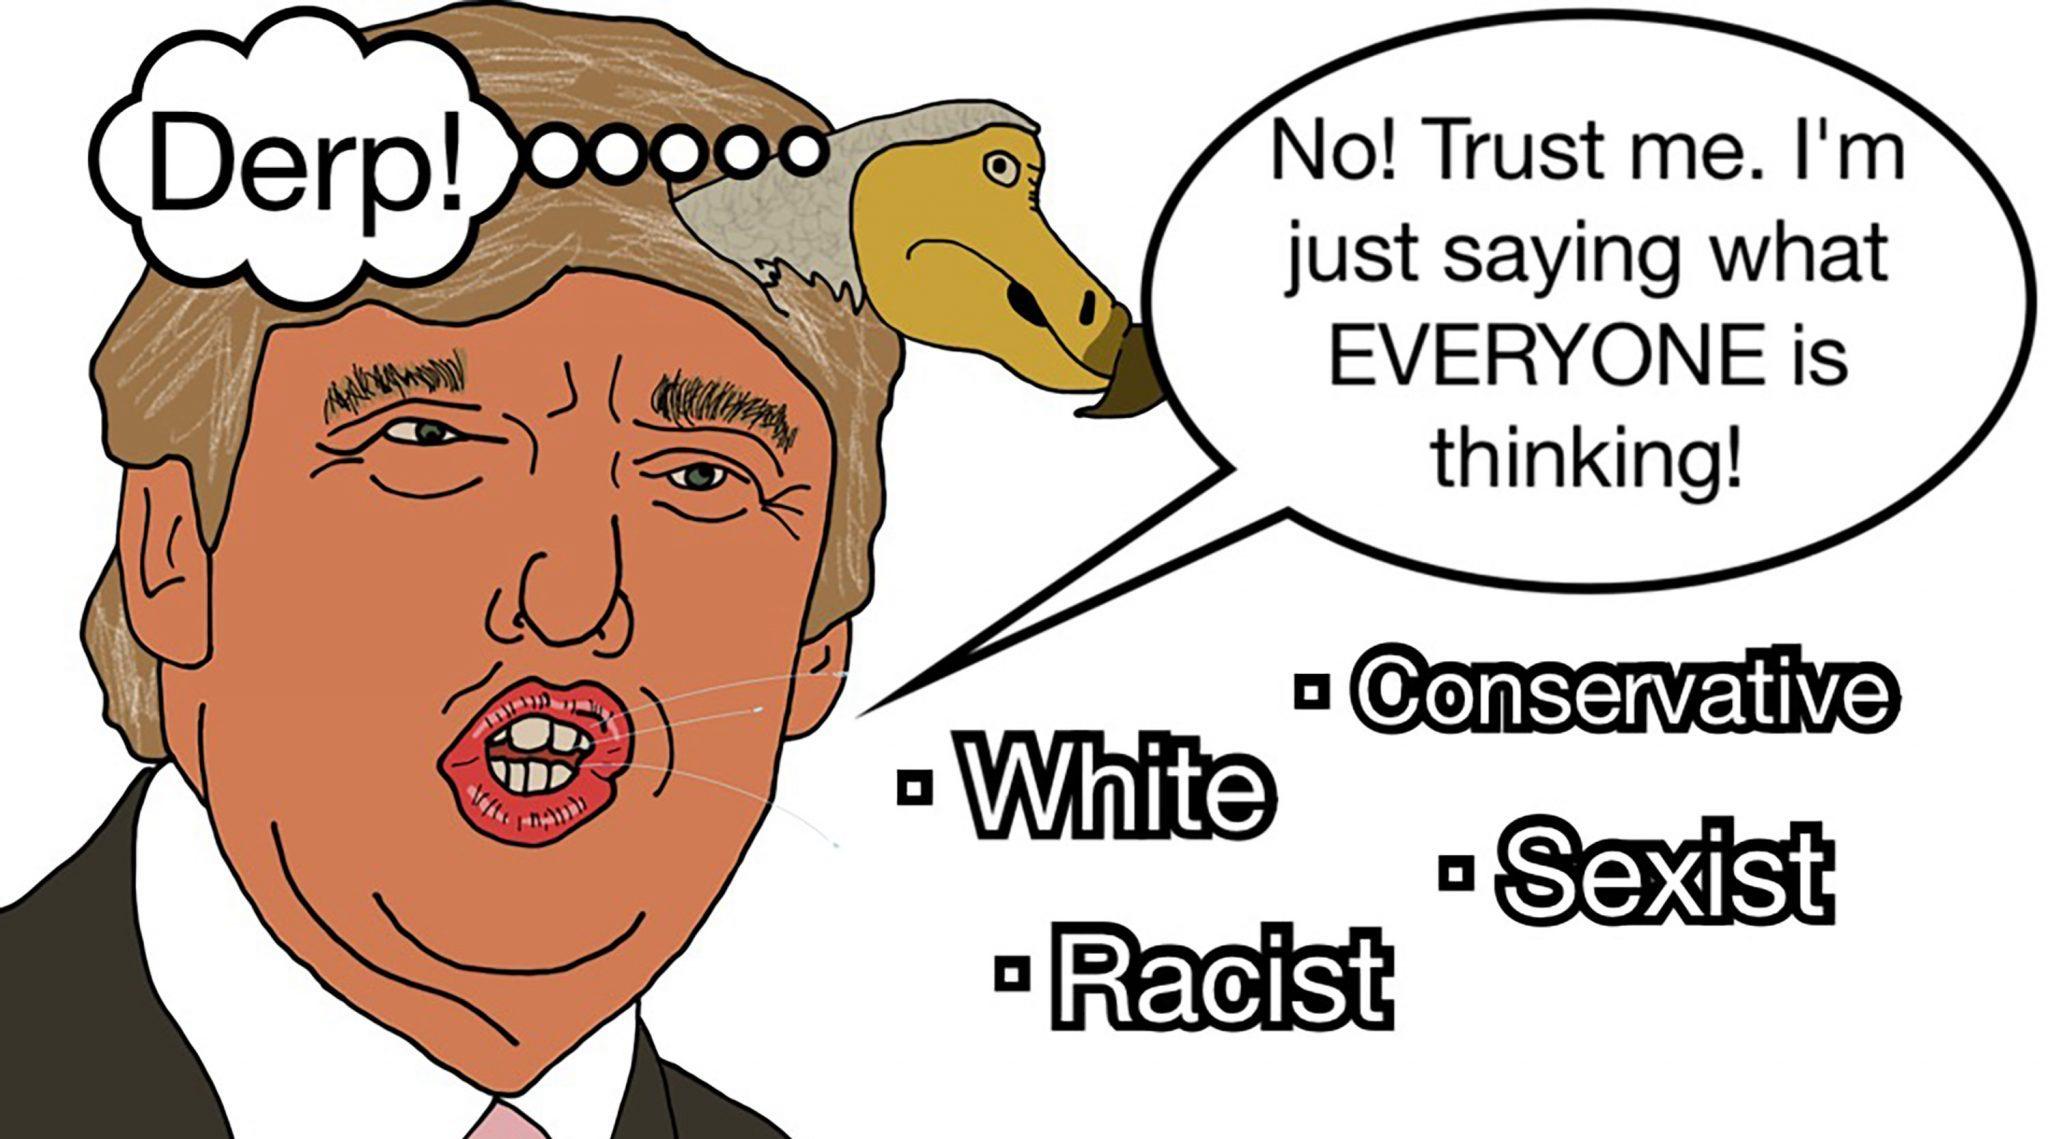 Cartoon by Mick Donovan